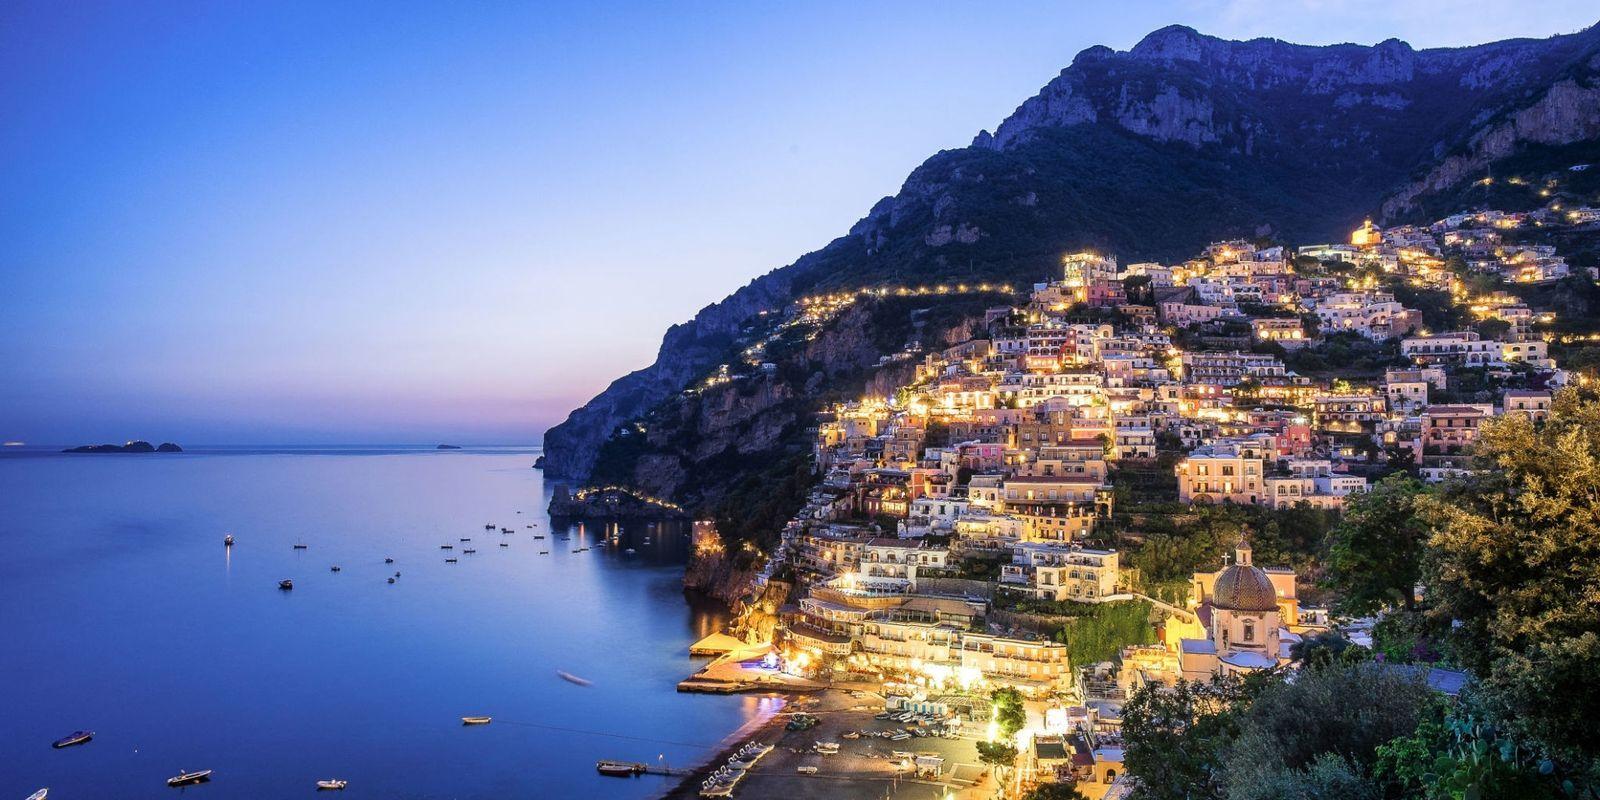 27 Photos That Prove Italy Is Heaven On Earth - ELLEDecor.com